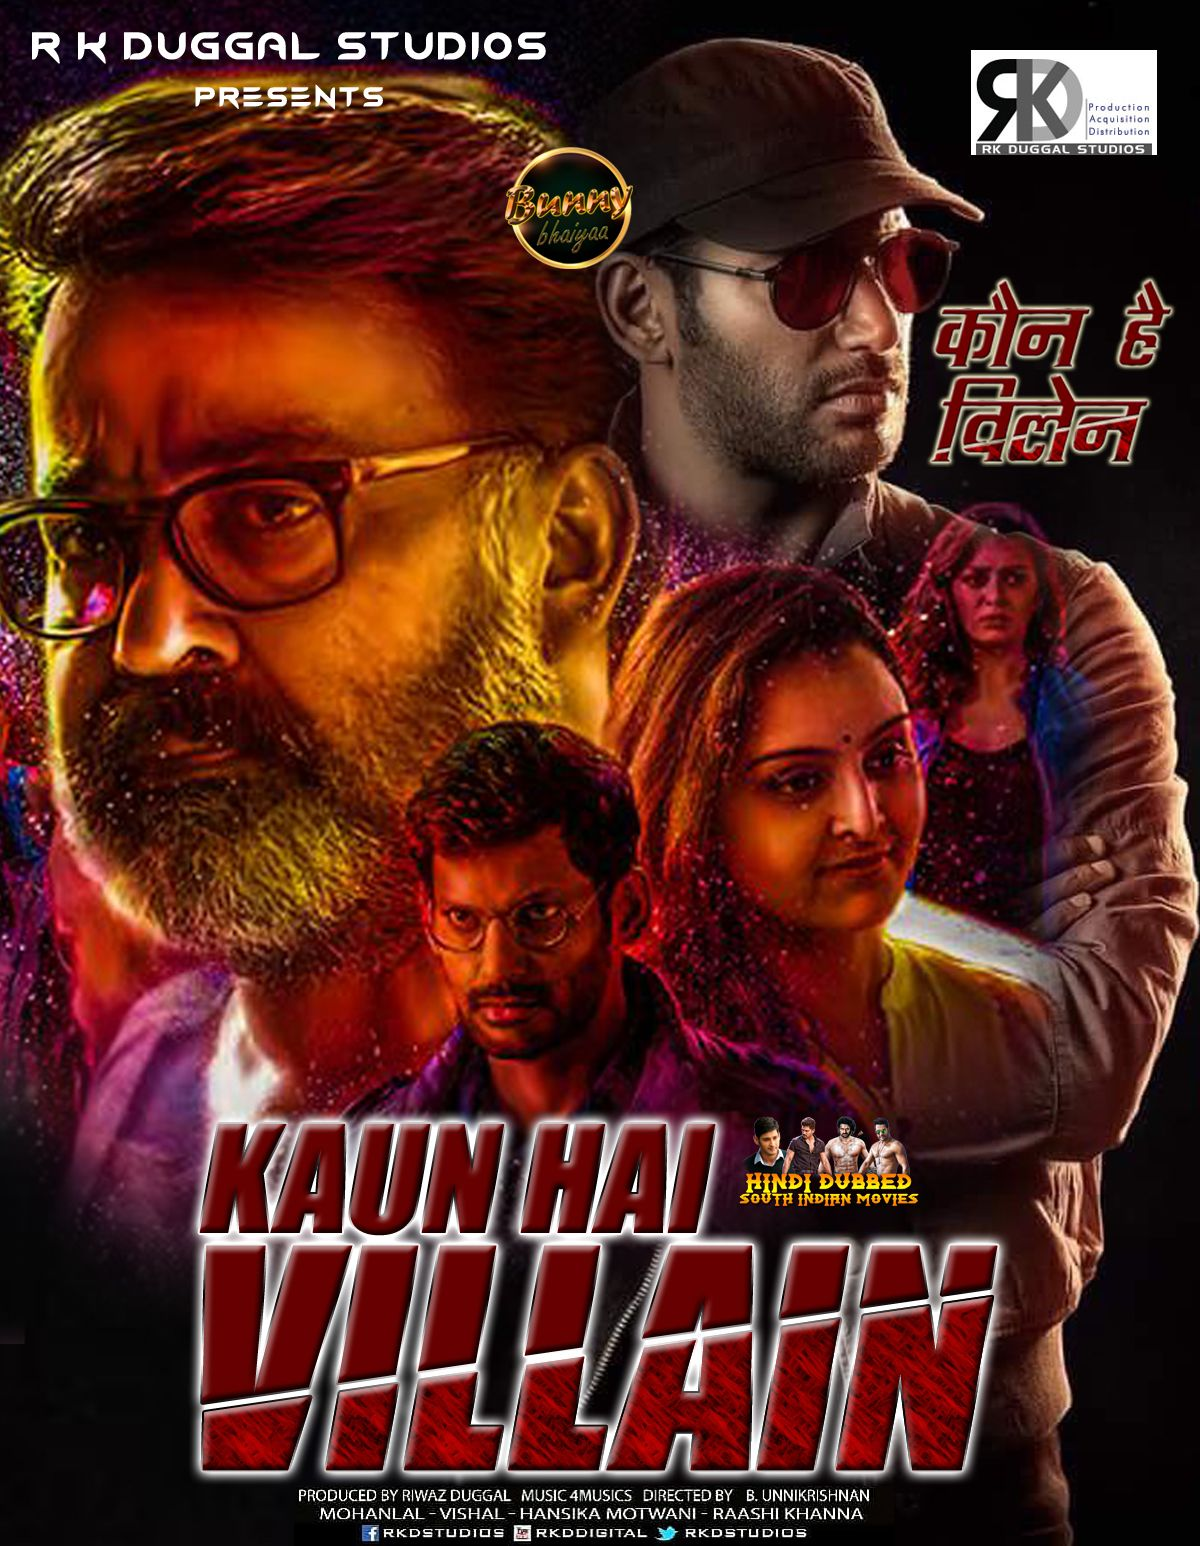 Villain (2017) Hindi Dual Audio 650MB UNCUT HDRip 720p HEVC x265